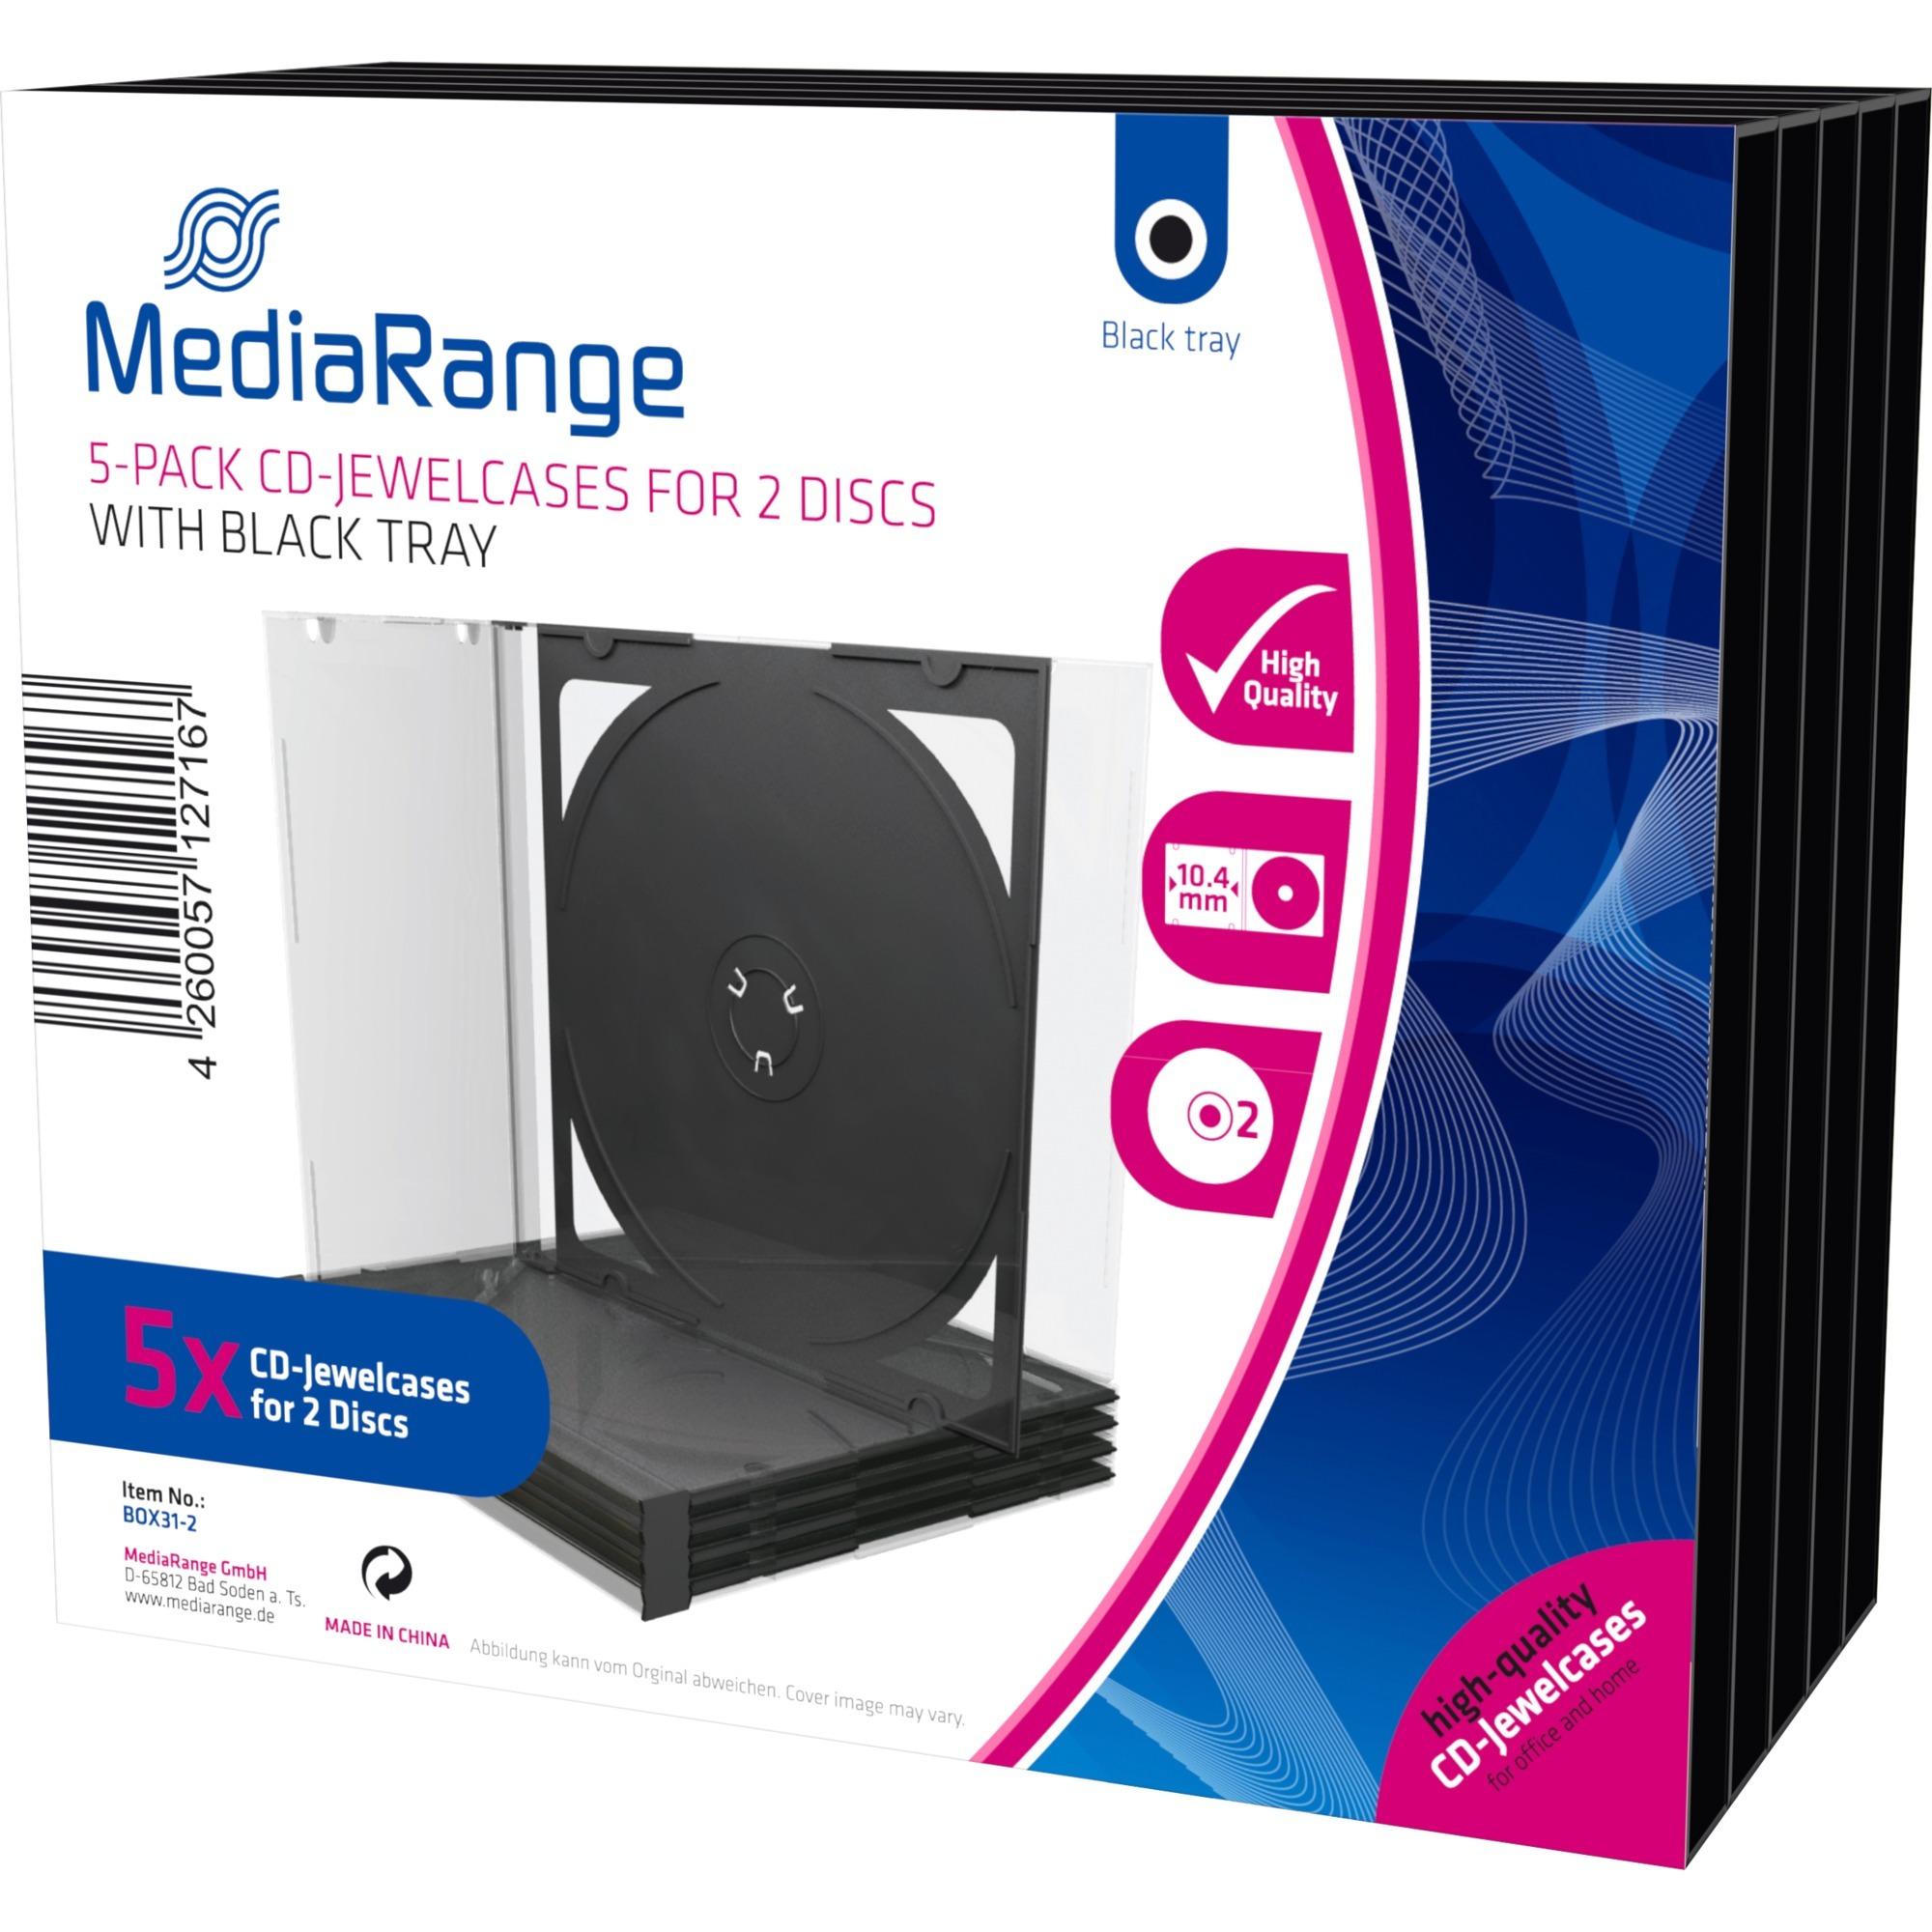 BOX31-2 funda para discos ópticos Caja transparente para CD 2 discos Negro, Transparente, Funda protectora